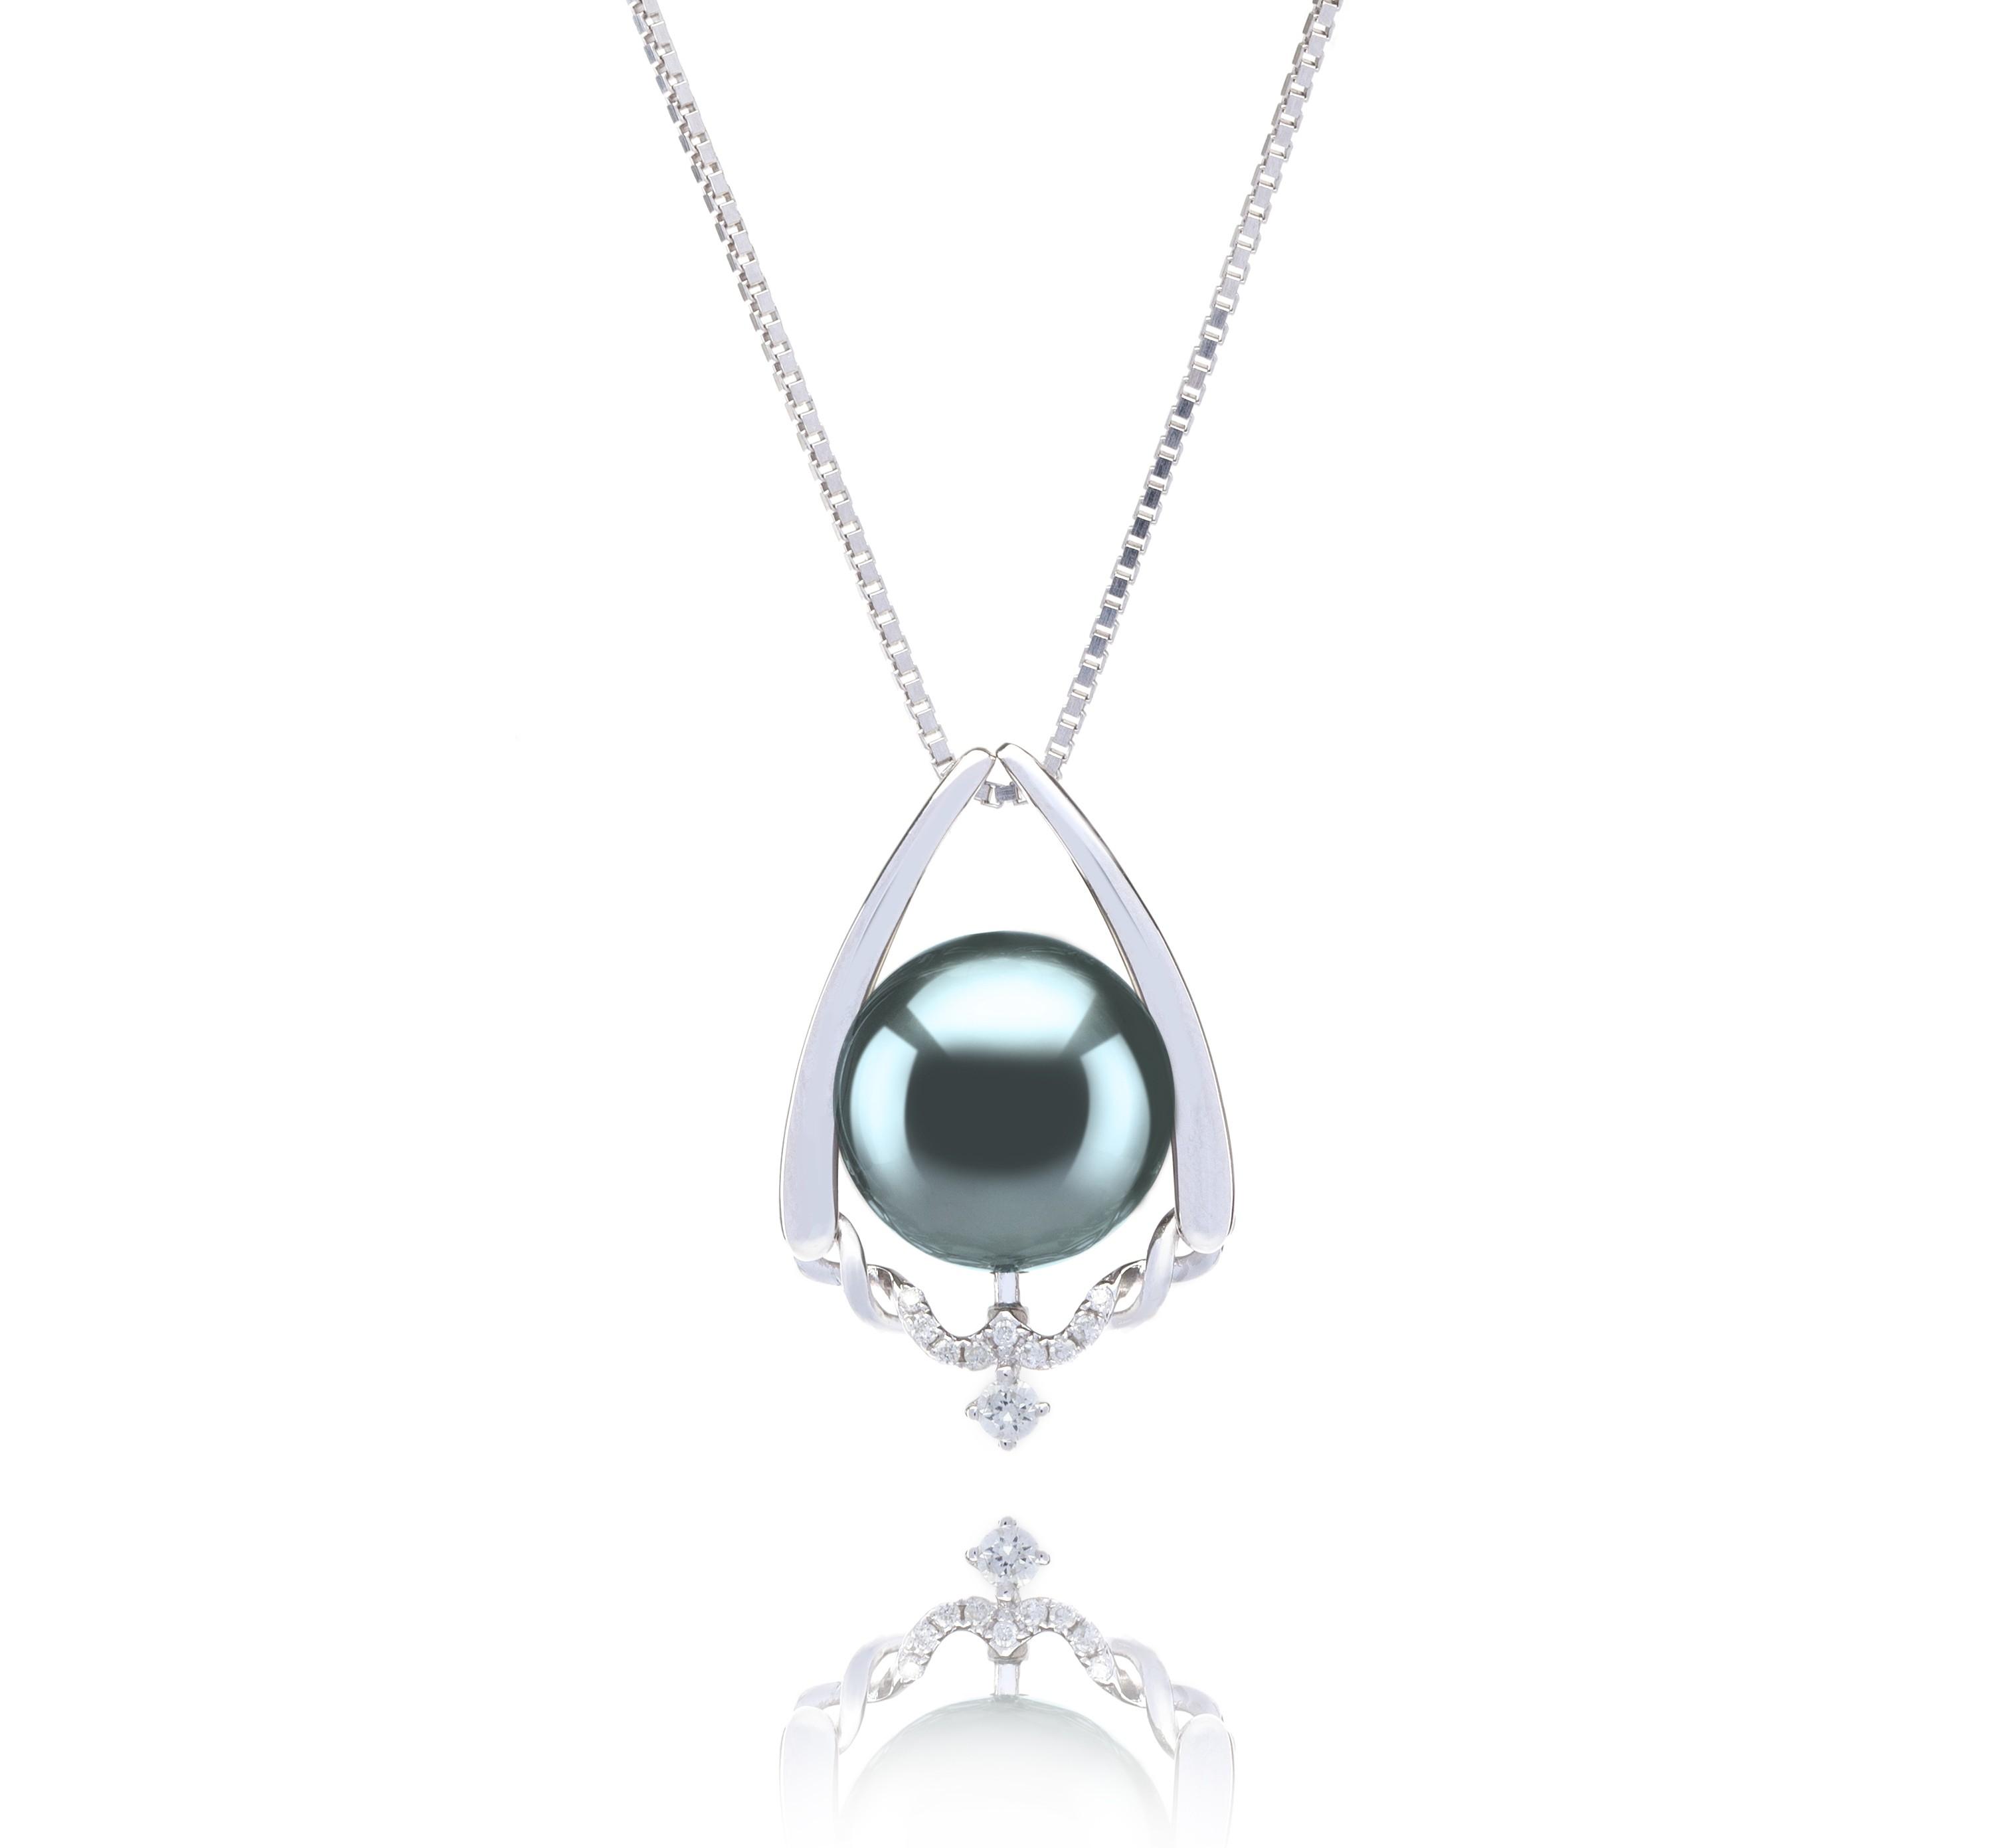 10-11mm AAA Quality Tahitian Cultured Pearl Pendant in Susan Black